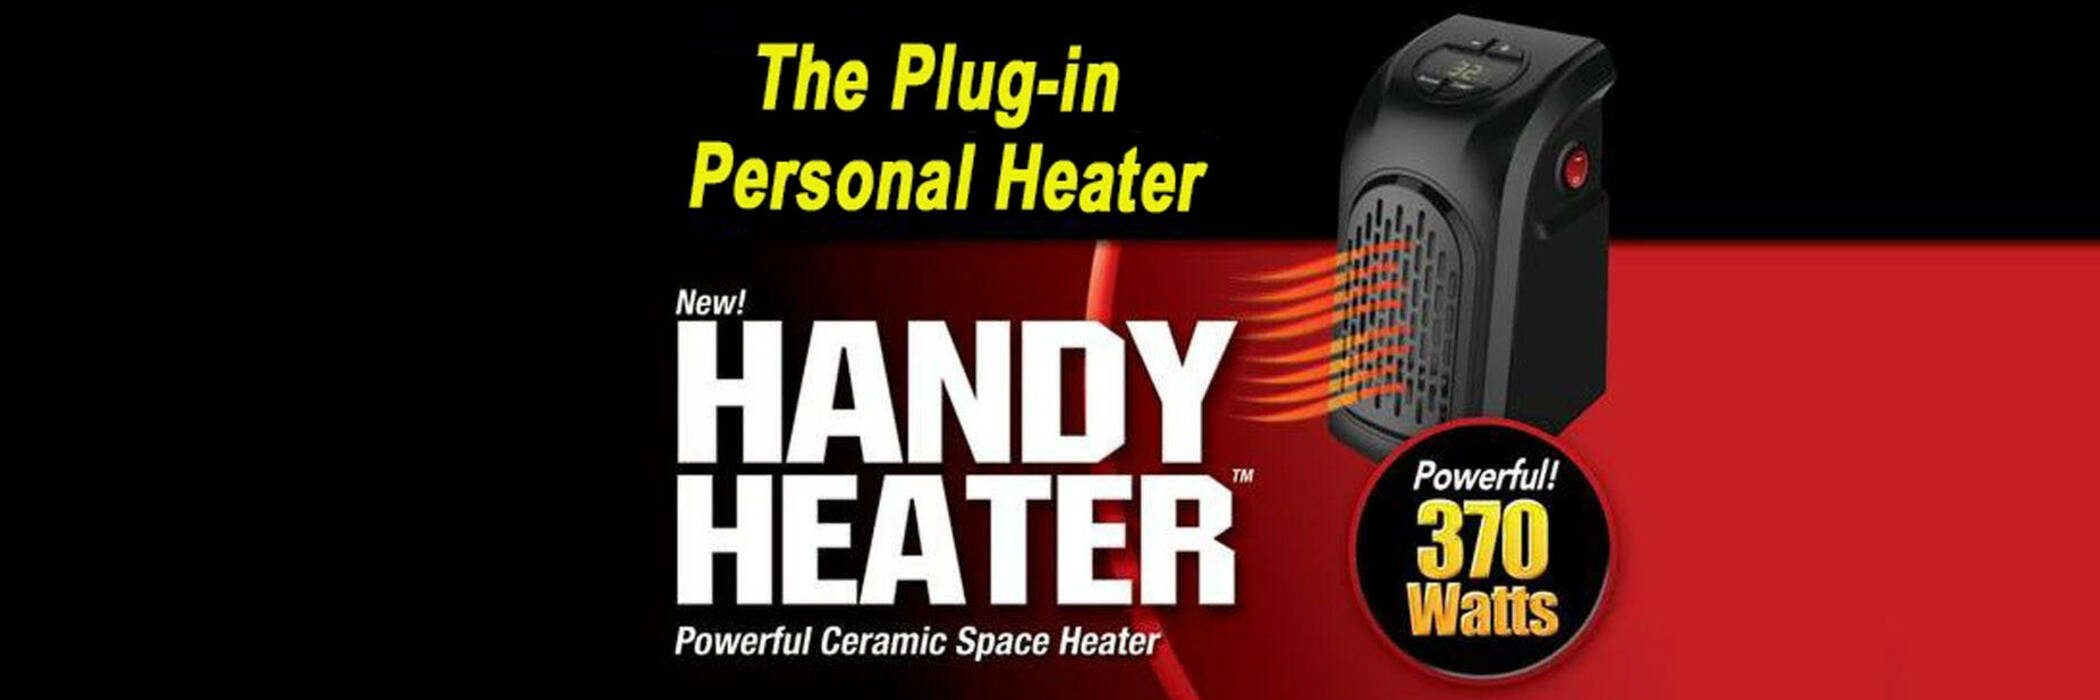 As seen on TV handy heater